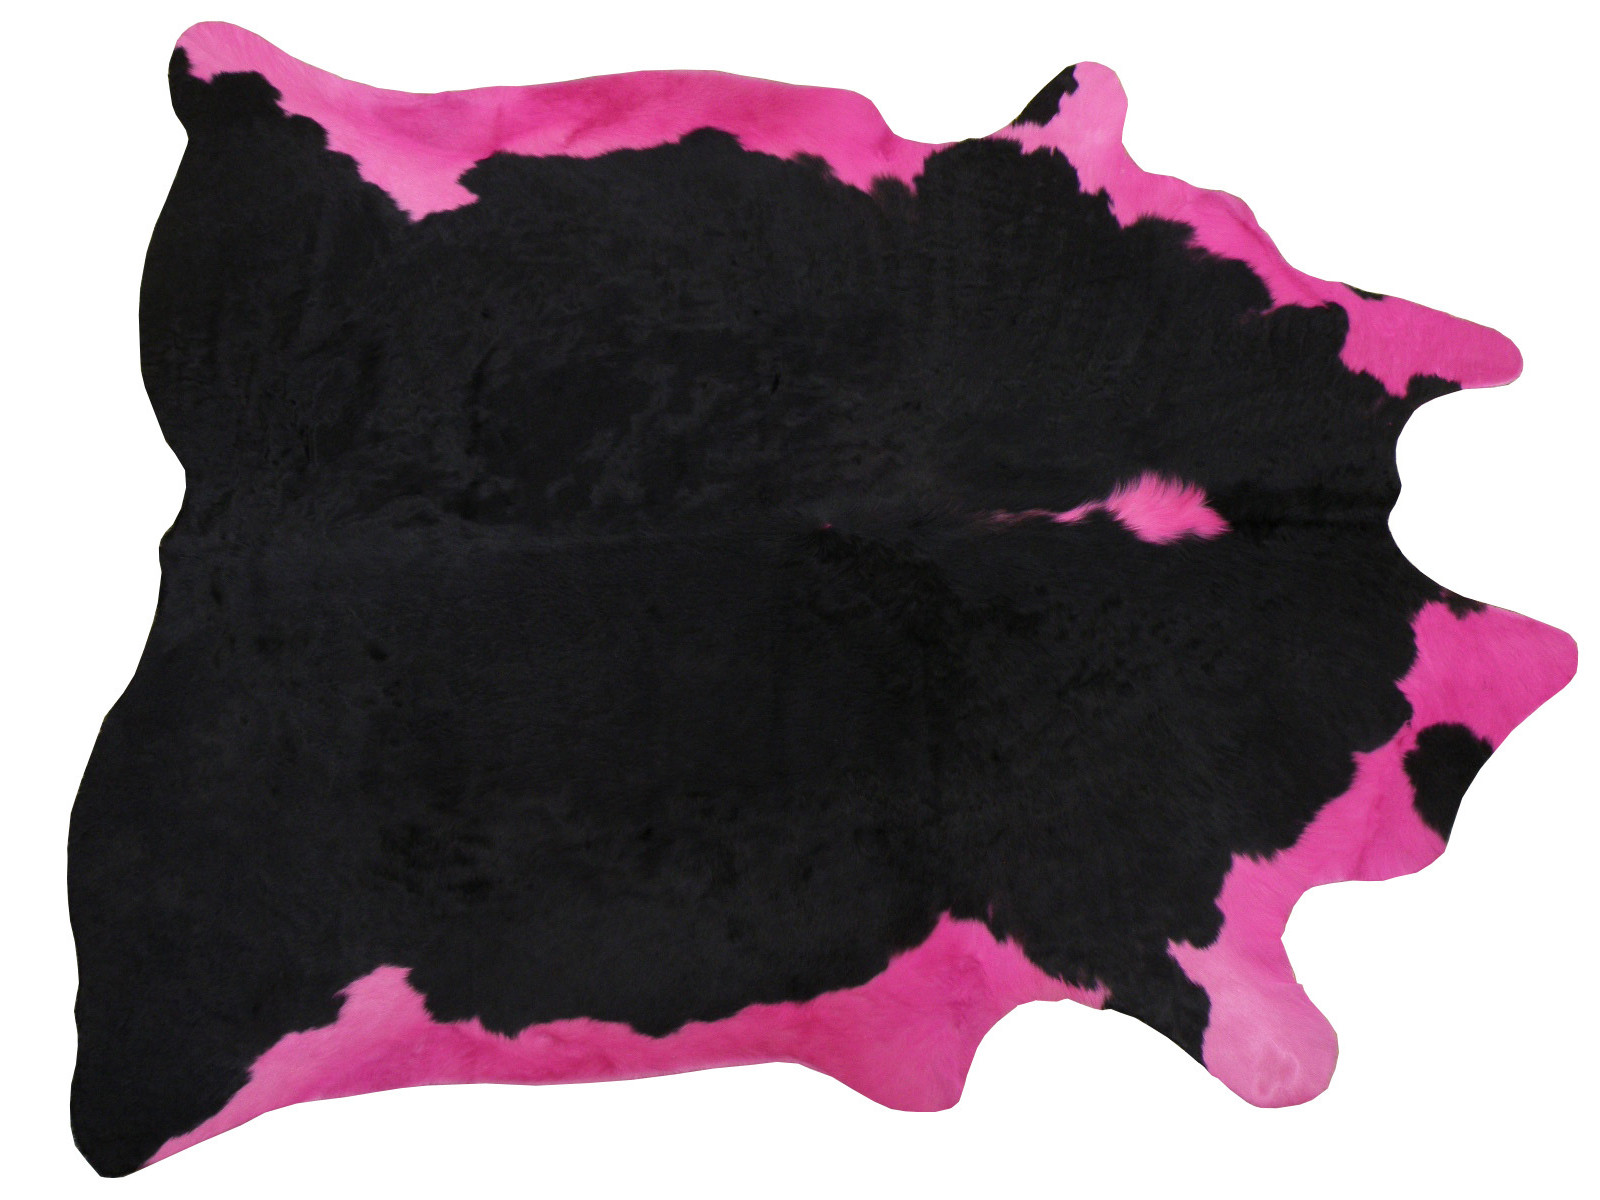 Декоративная шкура коровы черно-розовая арт. 25102